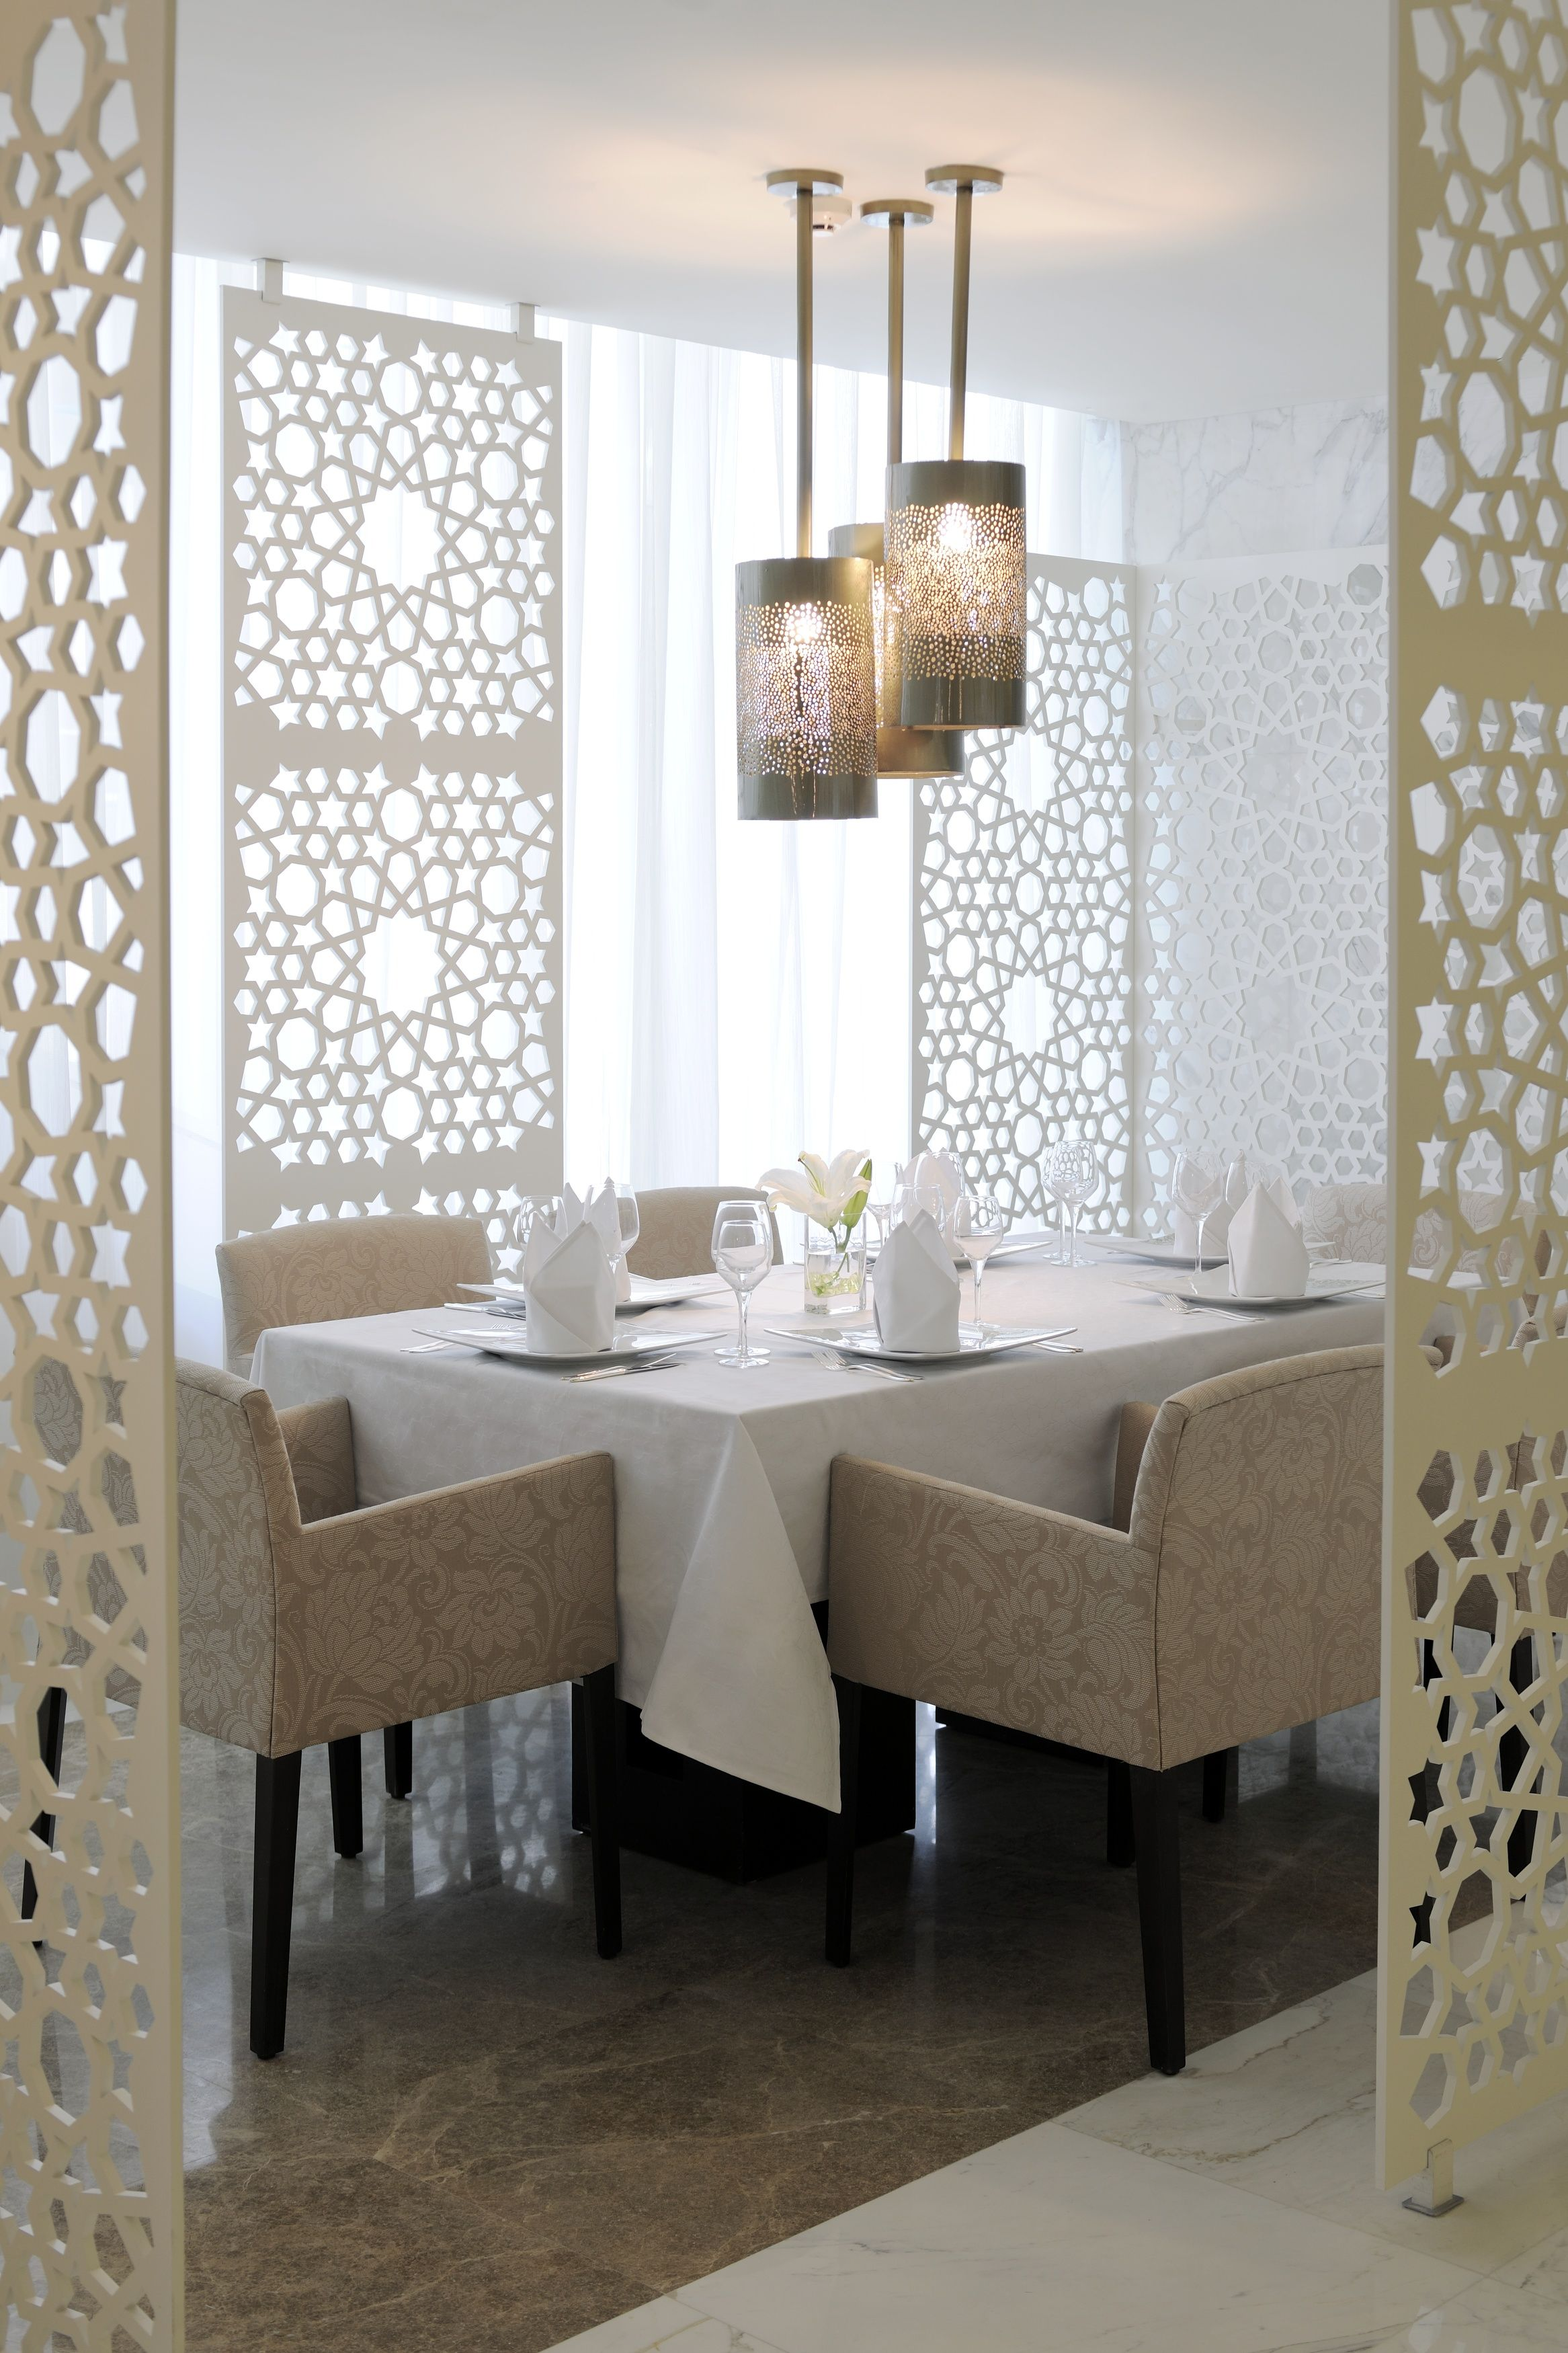 Arabic Restaurant Serving Arabic Gulf Food Concept And Design By Dlg Dining Room Decor Modern Indian Interior Design Modern Interior